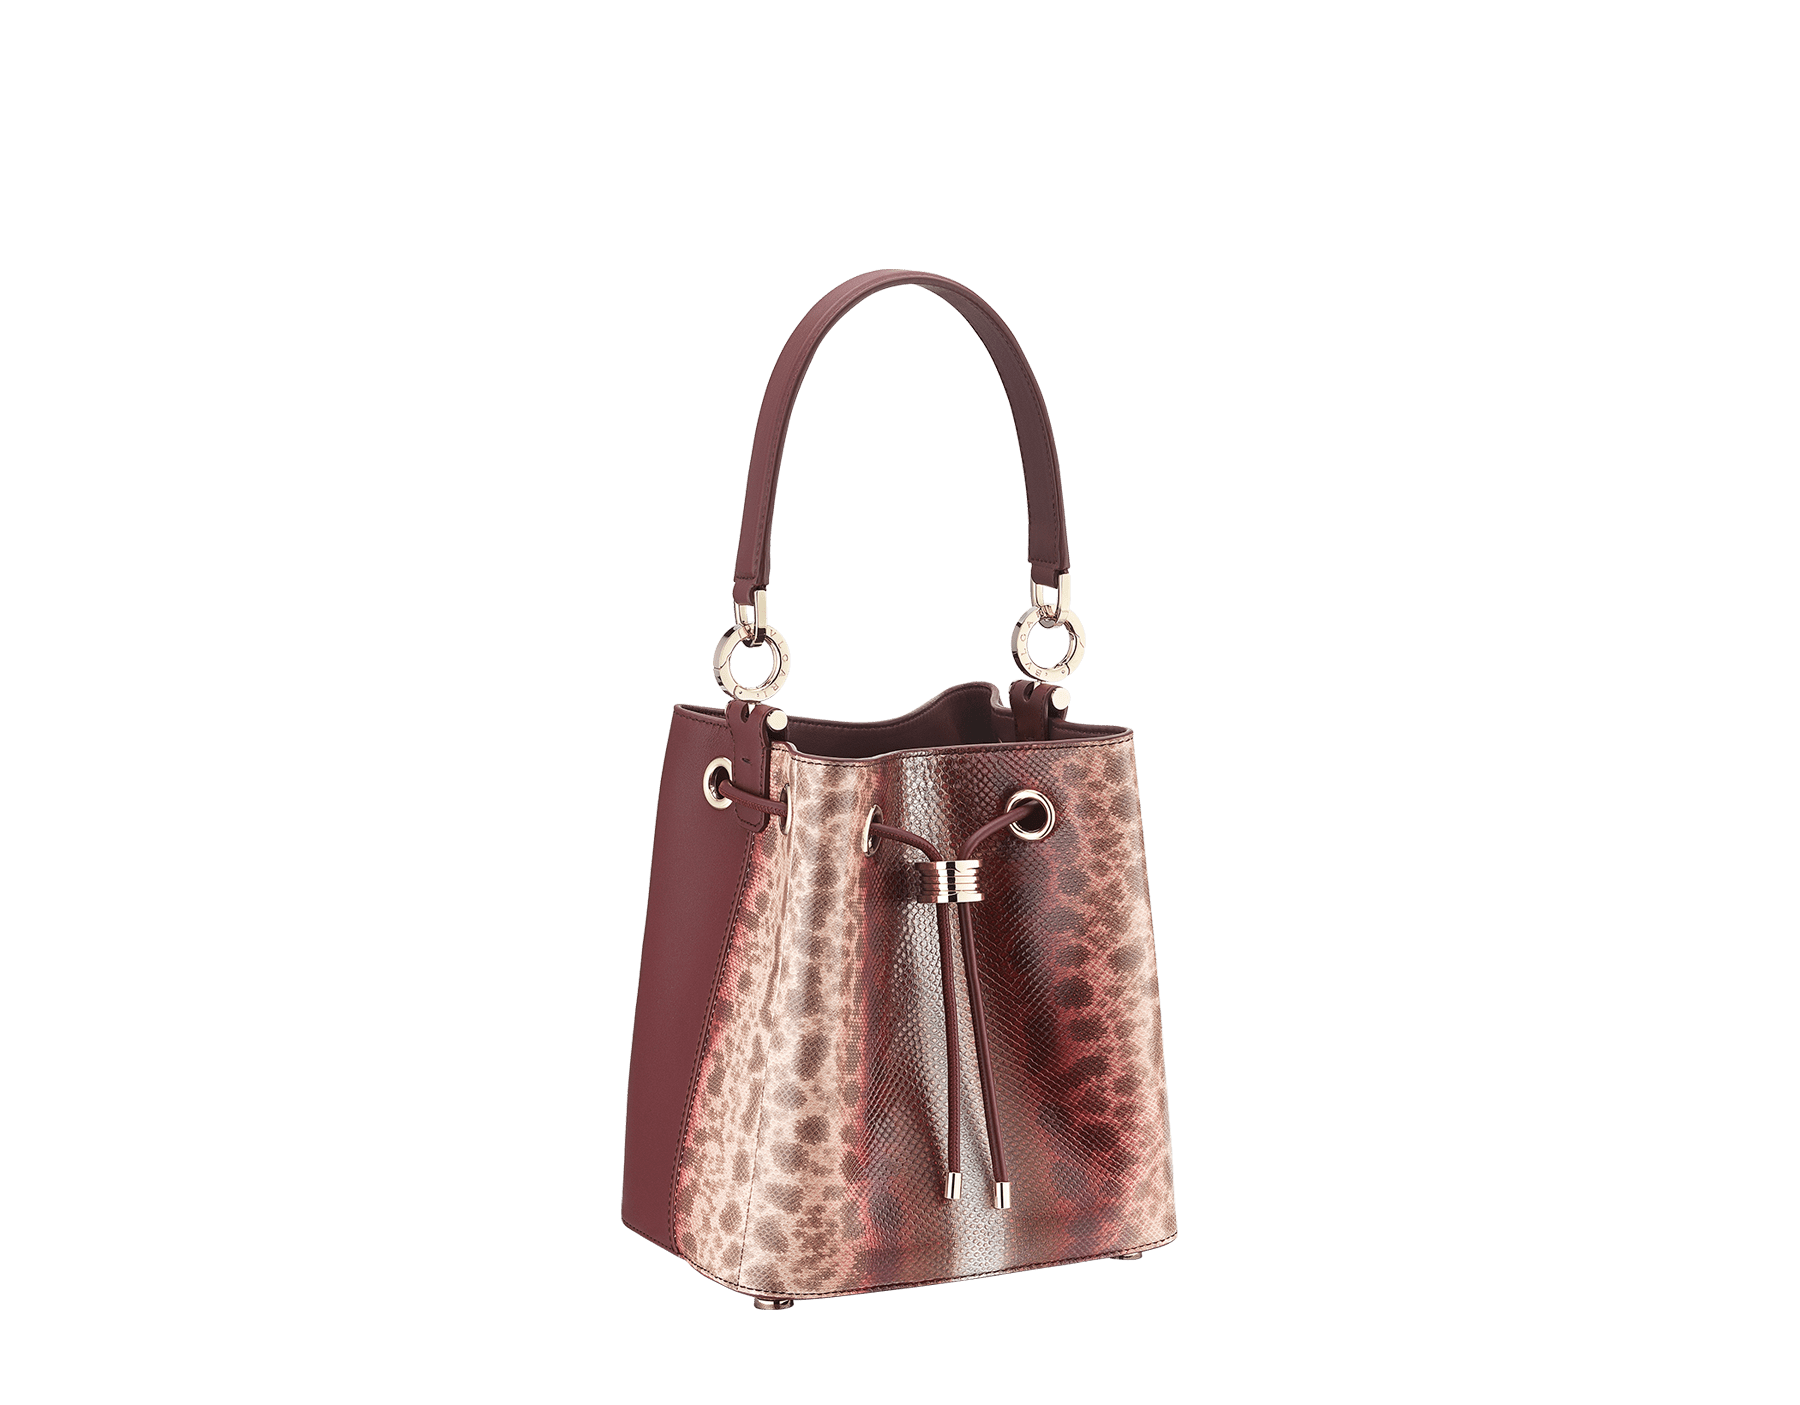 Bucket B.zero1 in rosa di francia Sahara karung skin and Roman garnet smooth calf leather with a Roman garnet nappa interior. Hardware in light gold plated brass, featuring B.zero1 décor. 289002 image 2